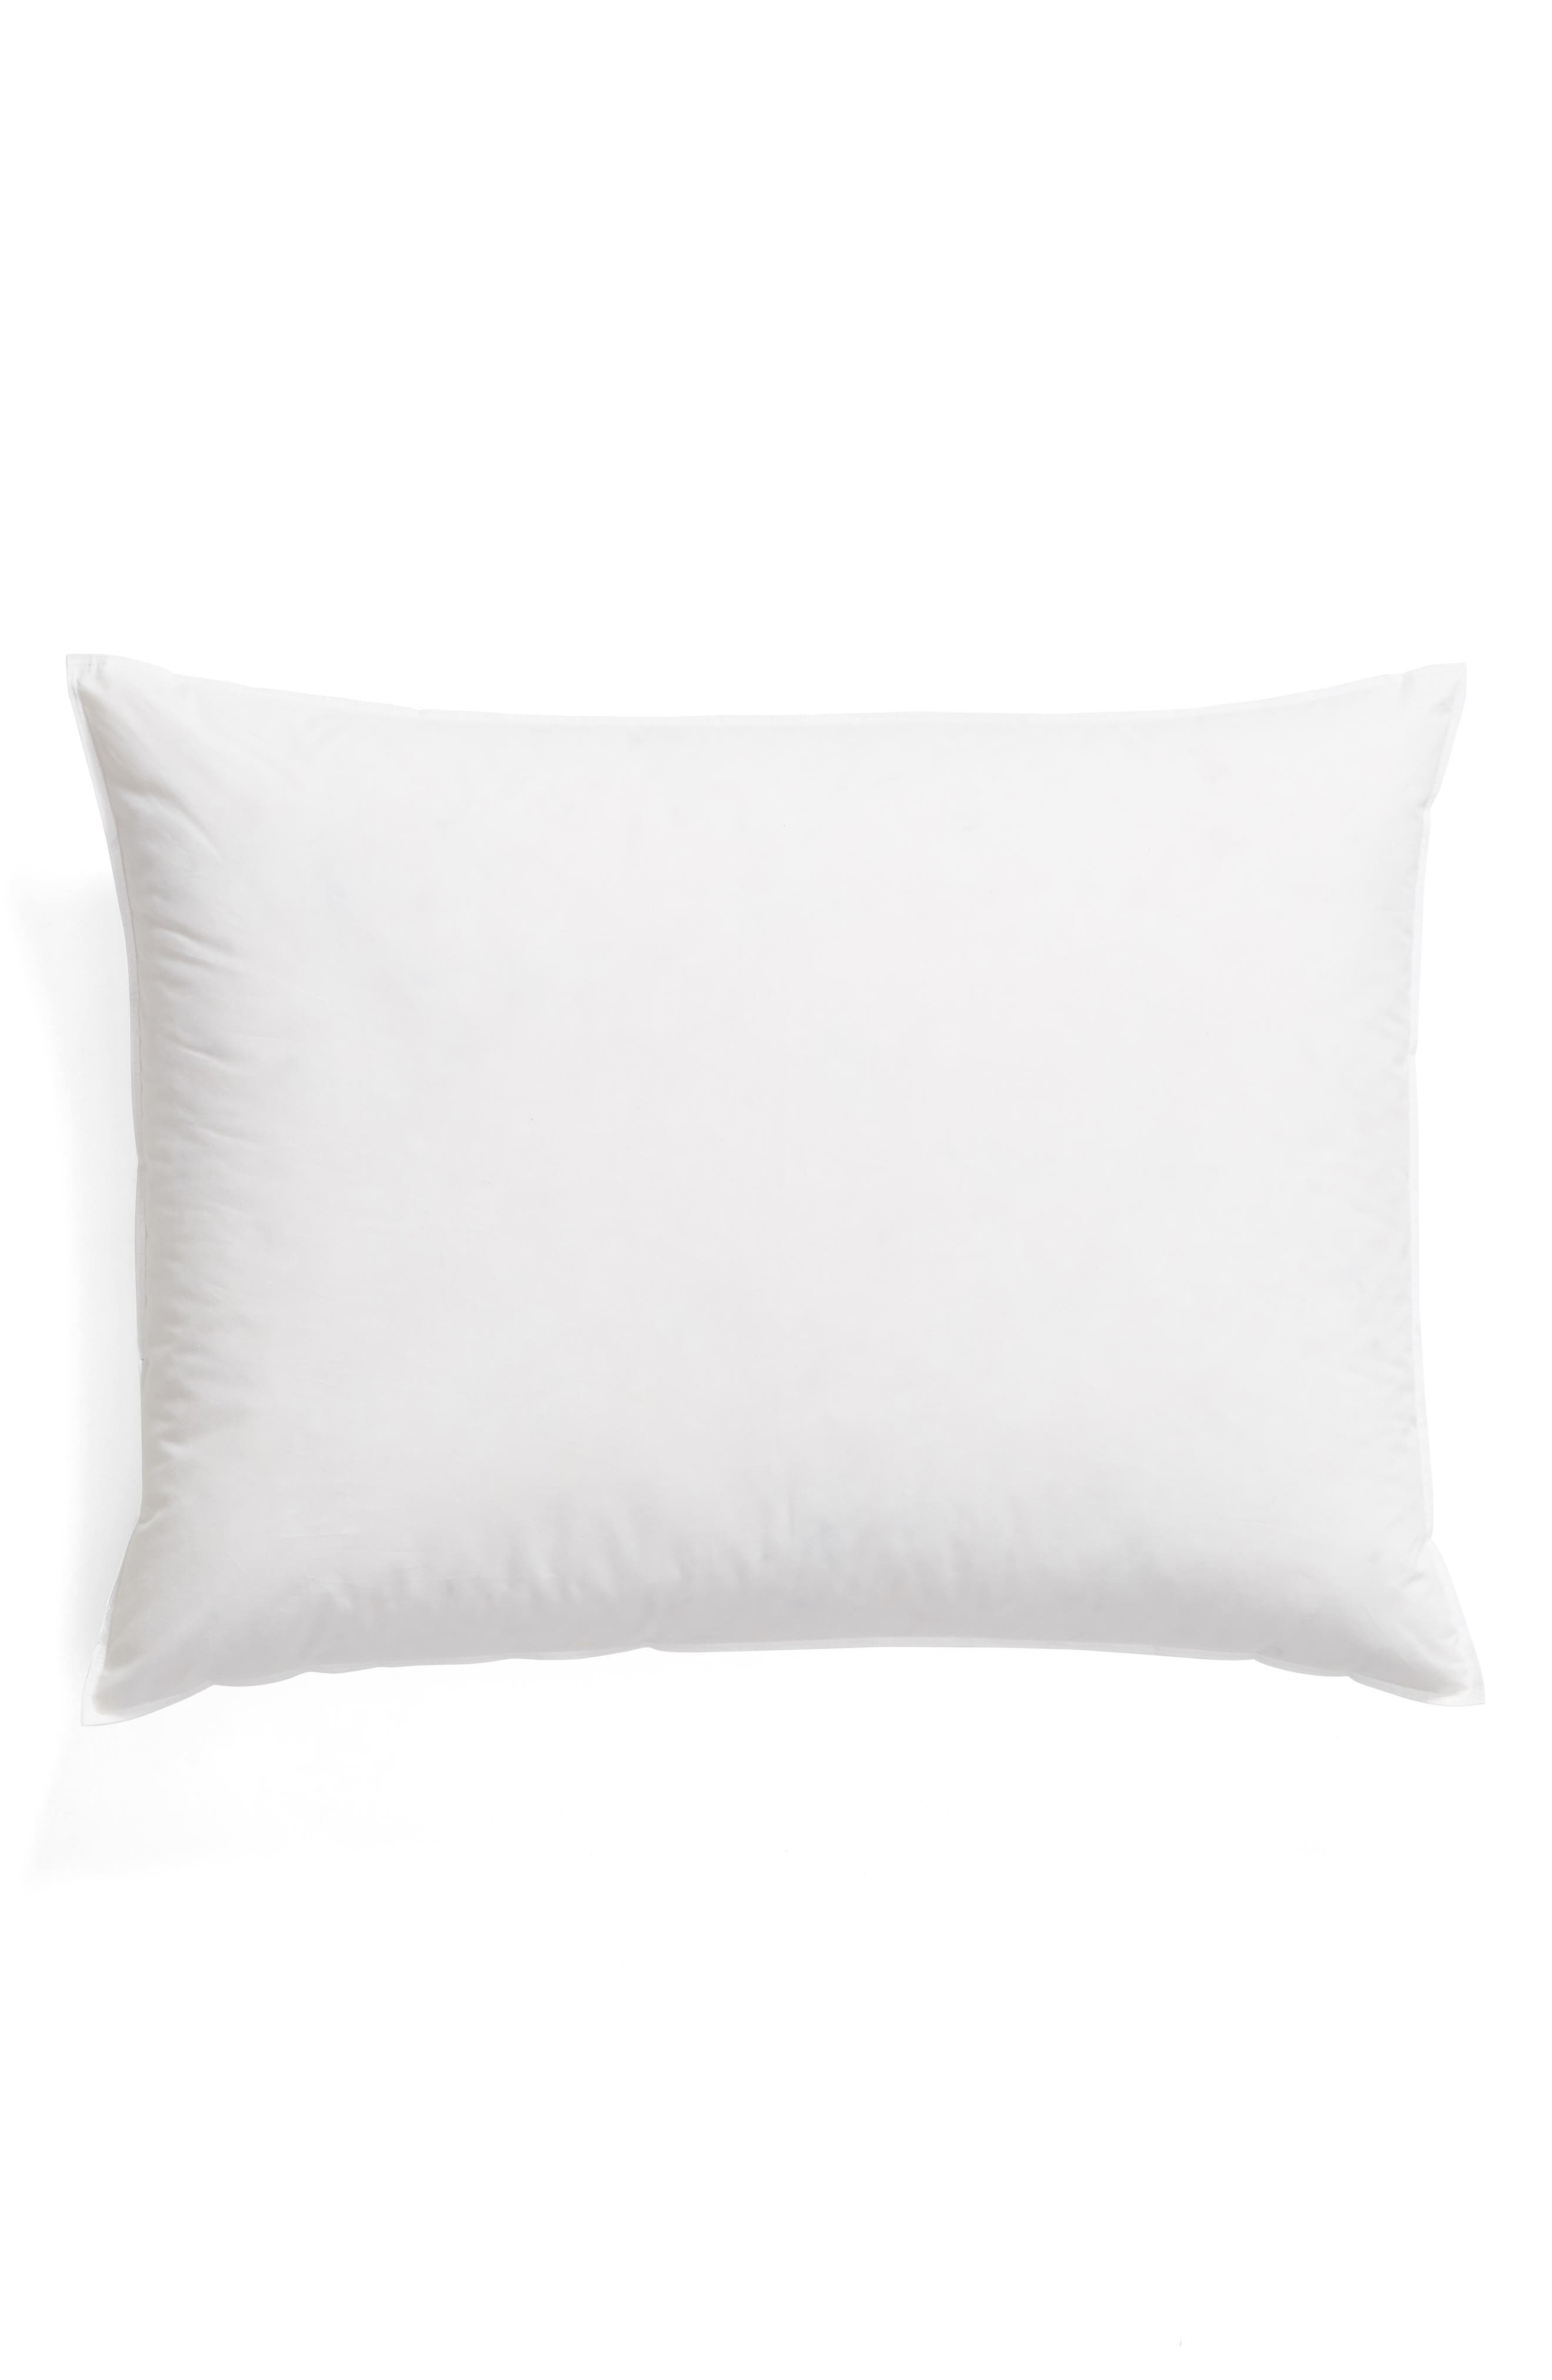 MATOUK,                             Montreux Firm 600 Fill Power Down 280 Thread Count Pillow,                             Main thumbnail 1, color,                             WHITE